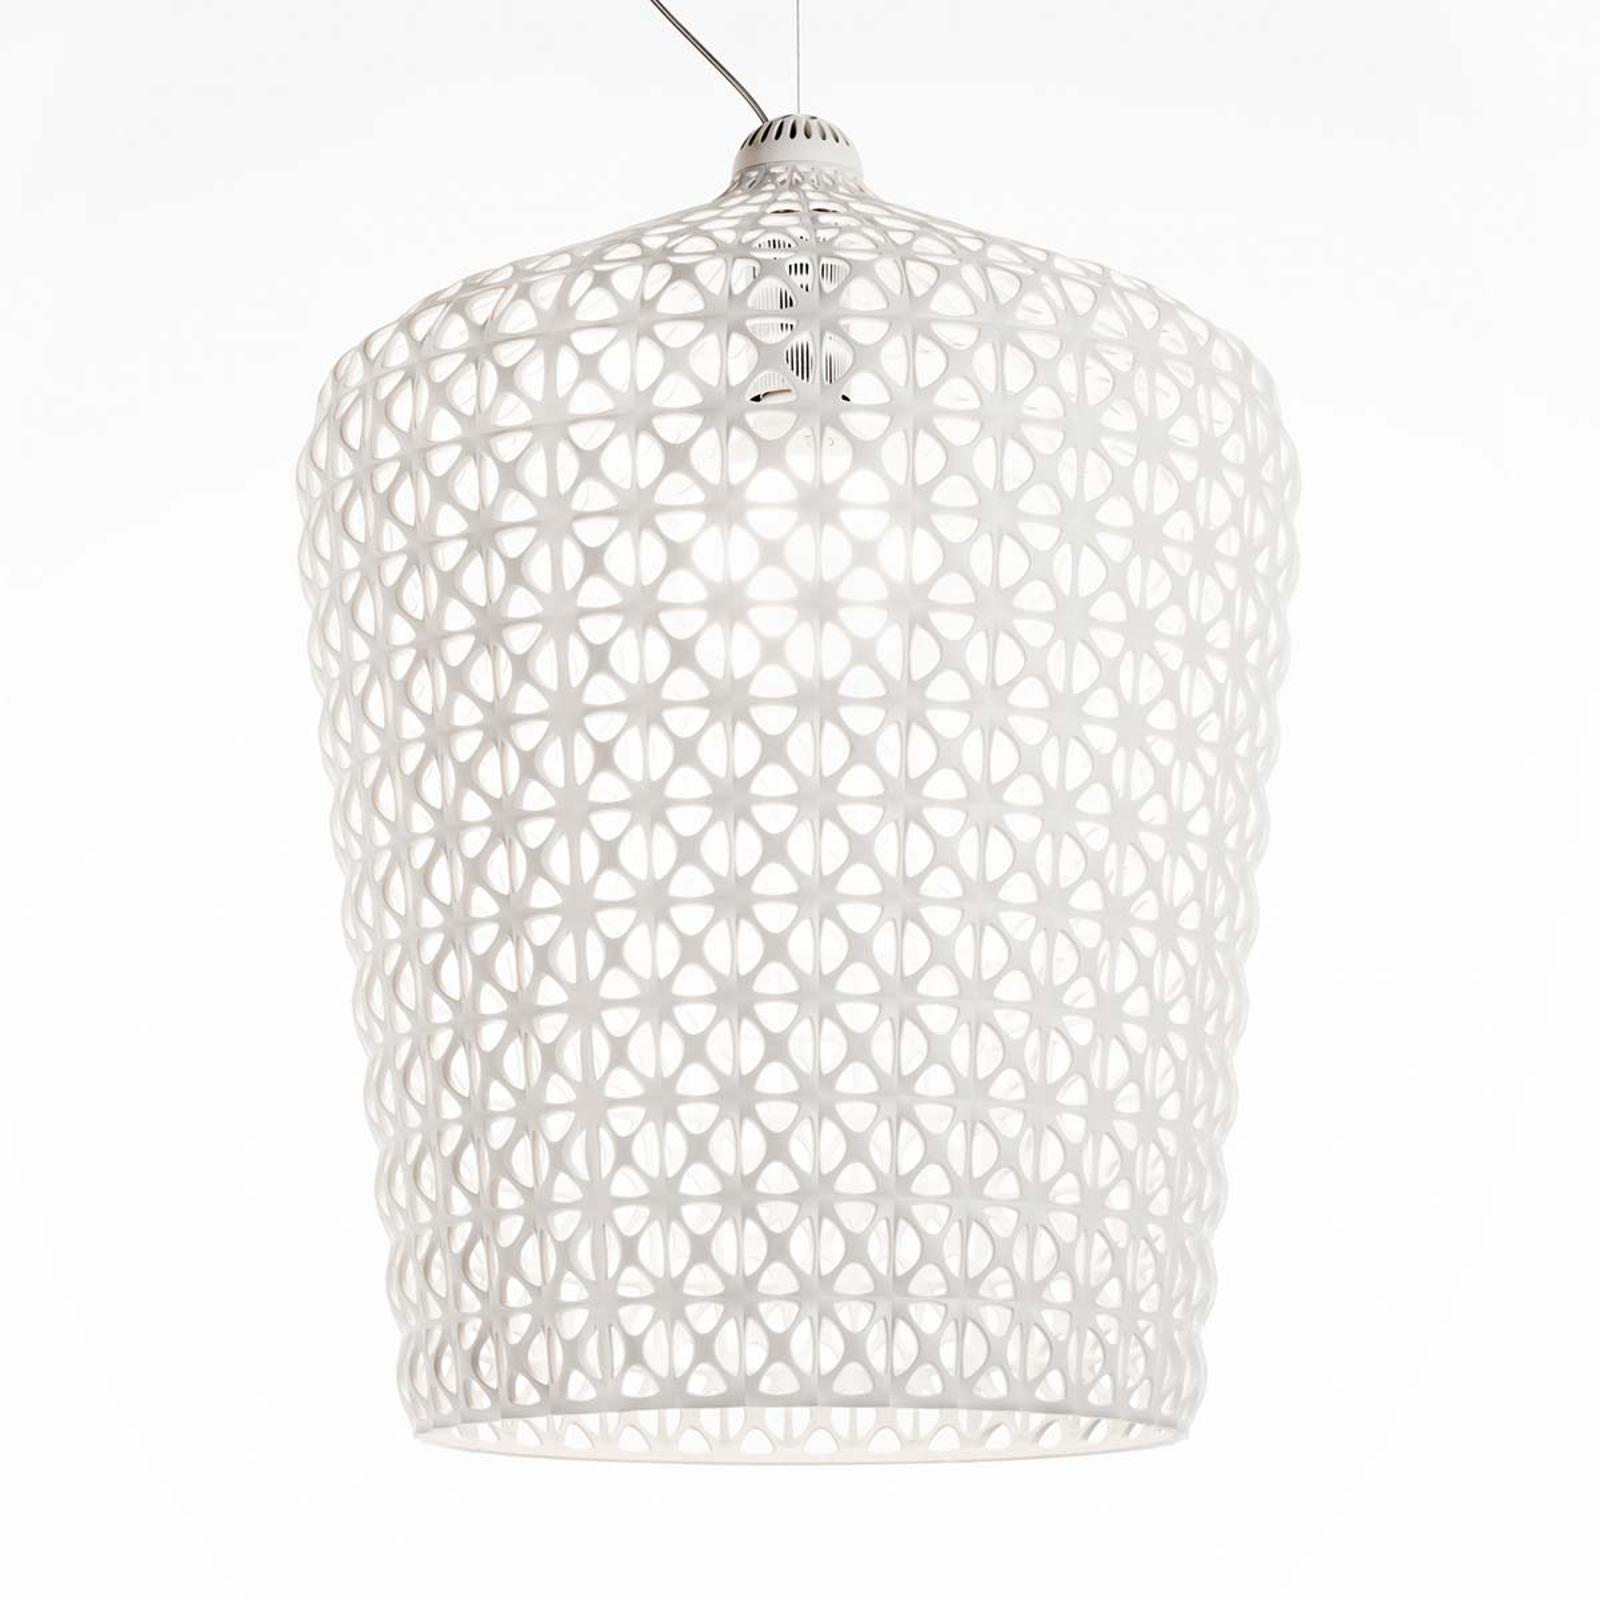 Designerska lampa wisząca Kabuki, biała